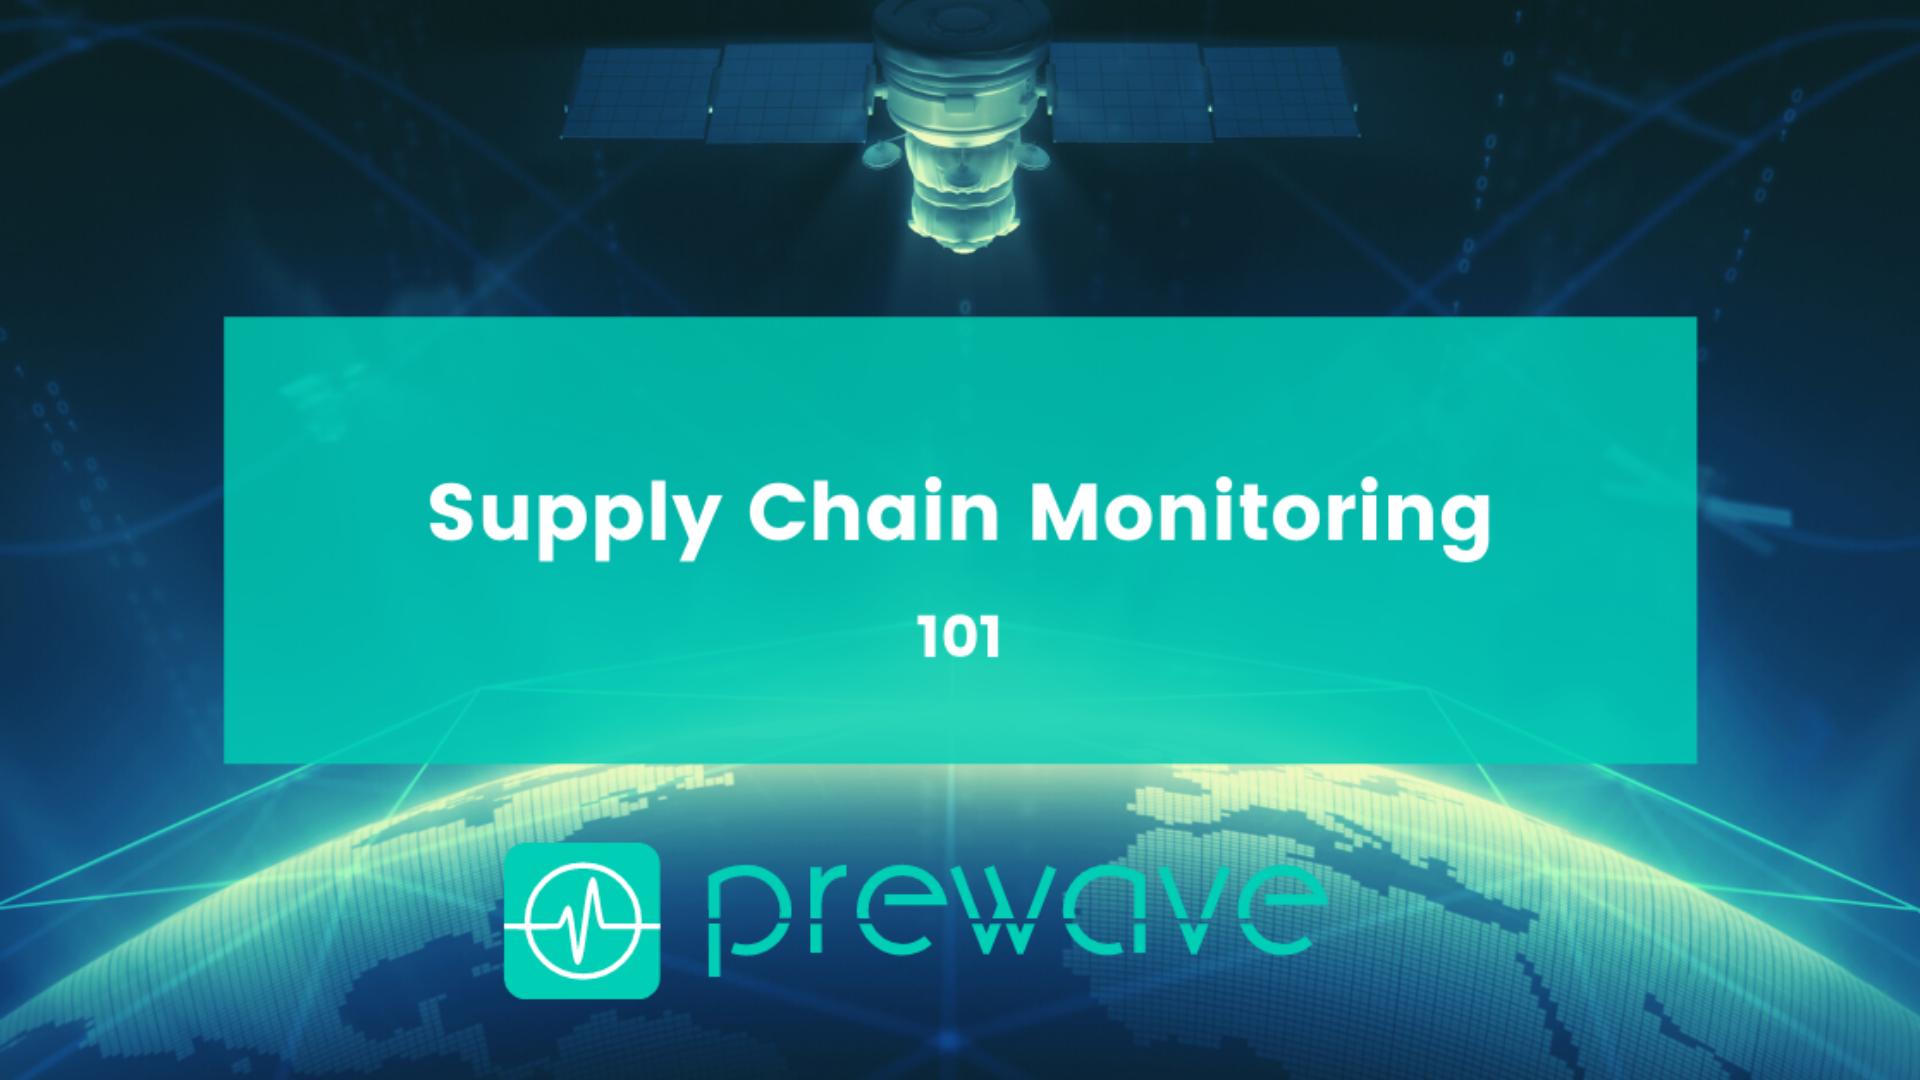 Prewave Supply Chain Monitoring 101